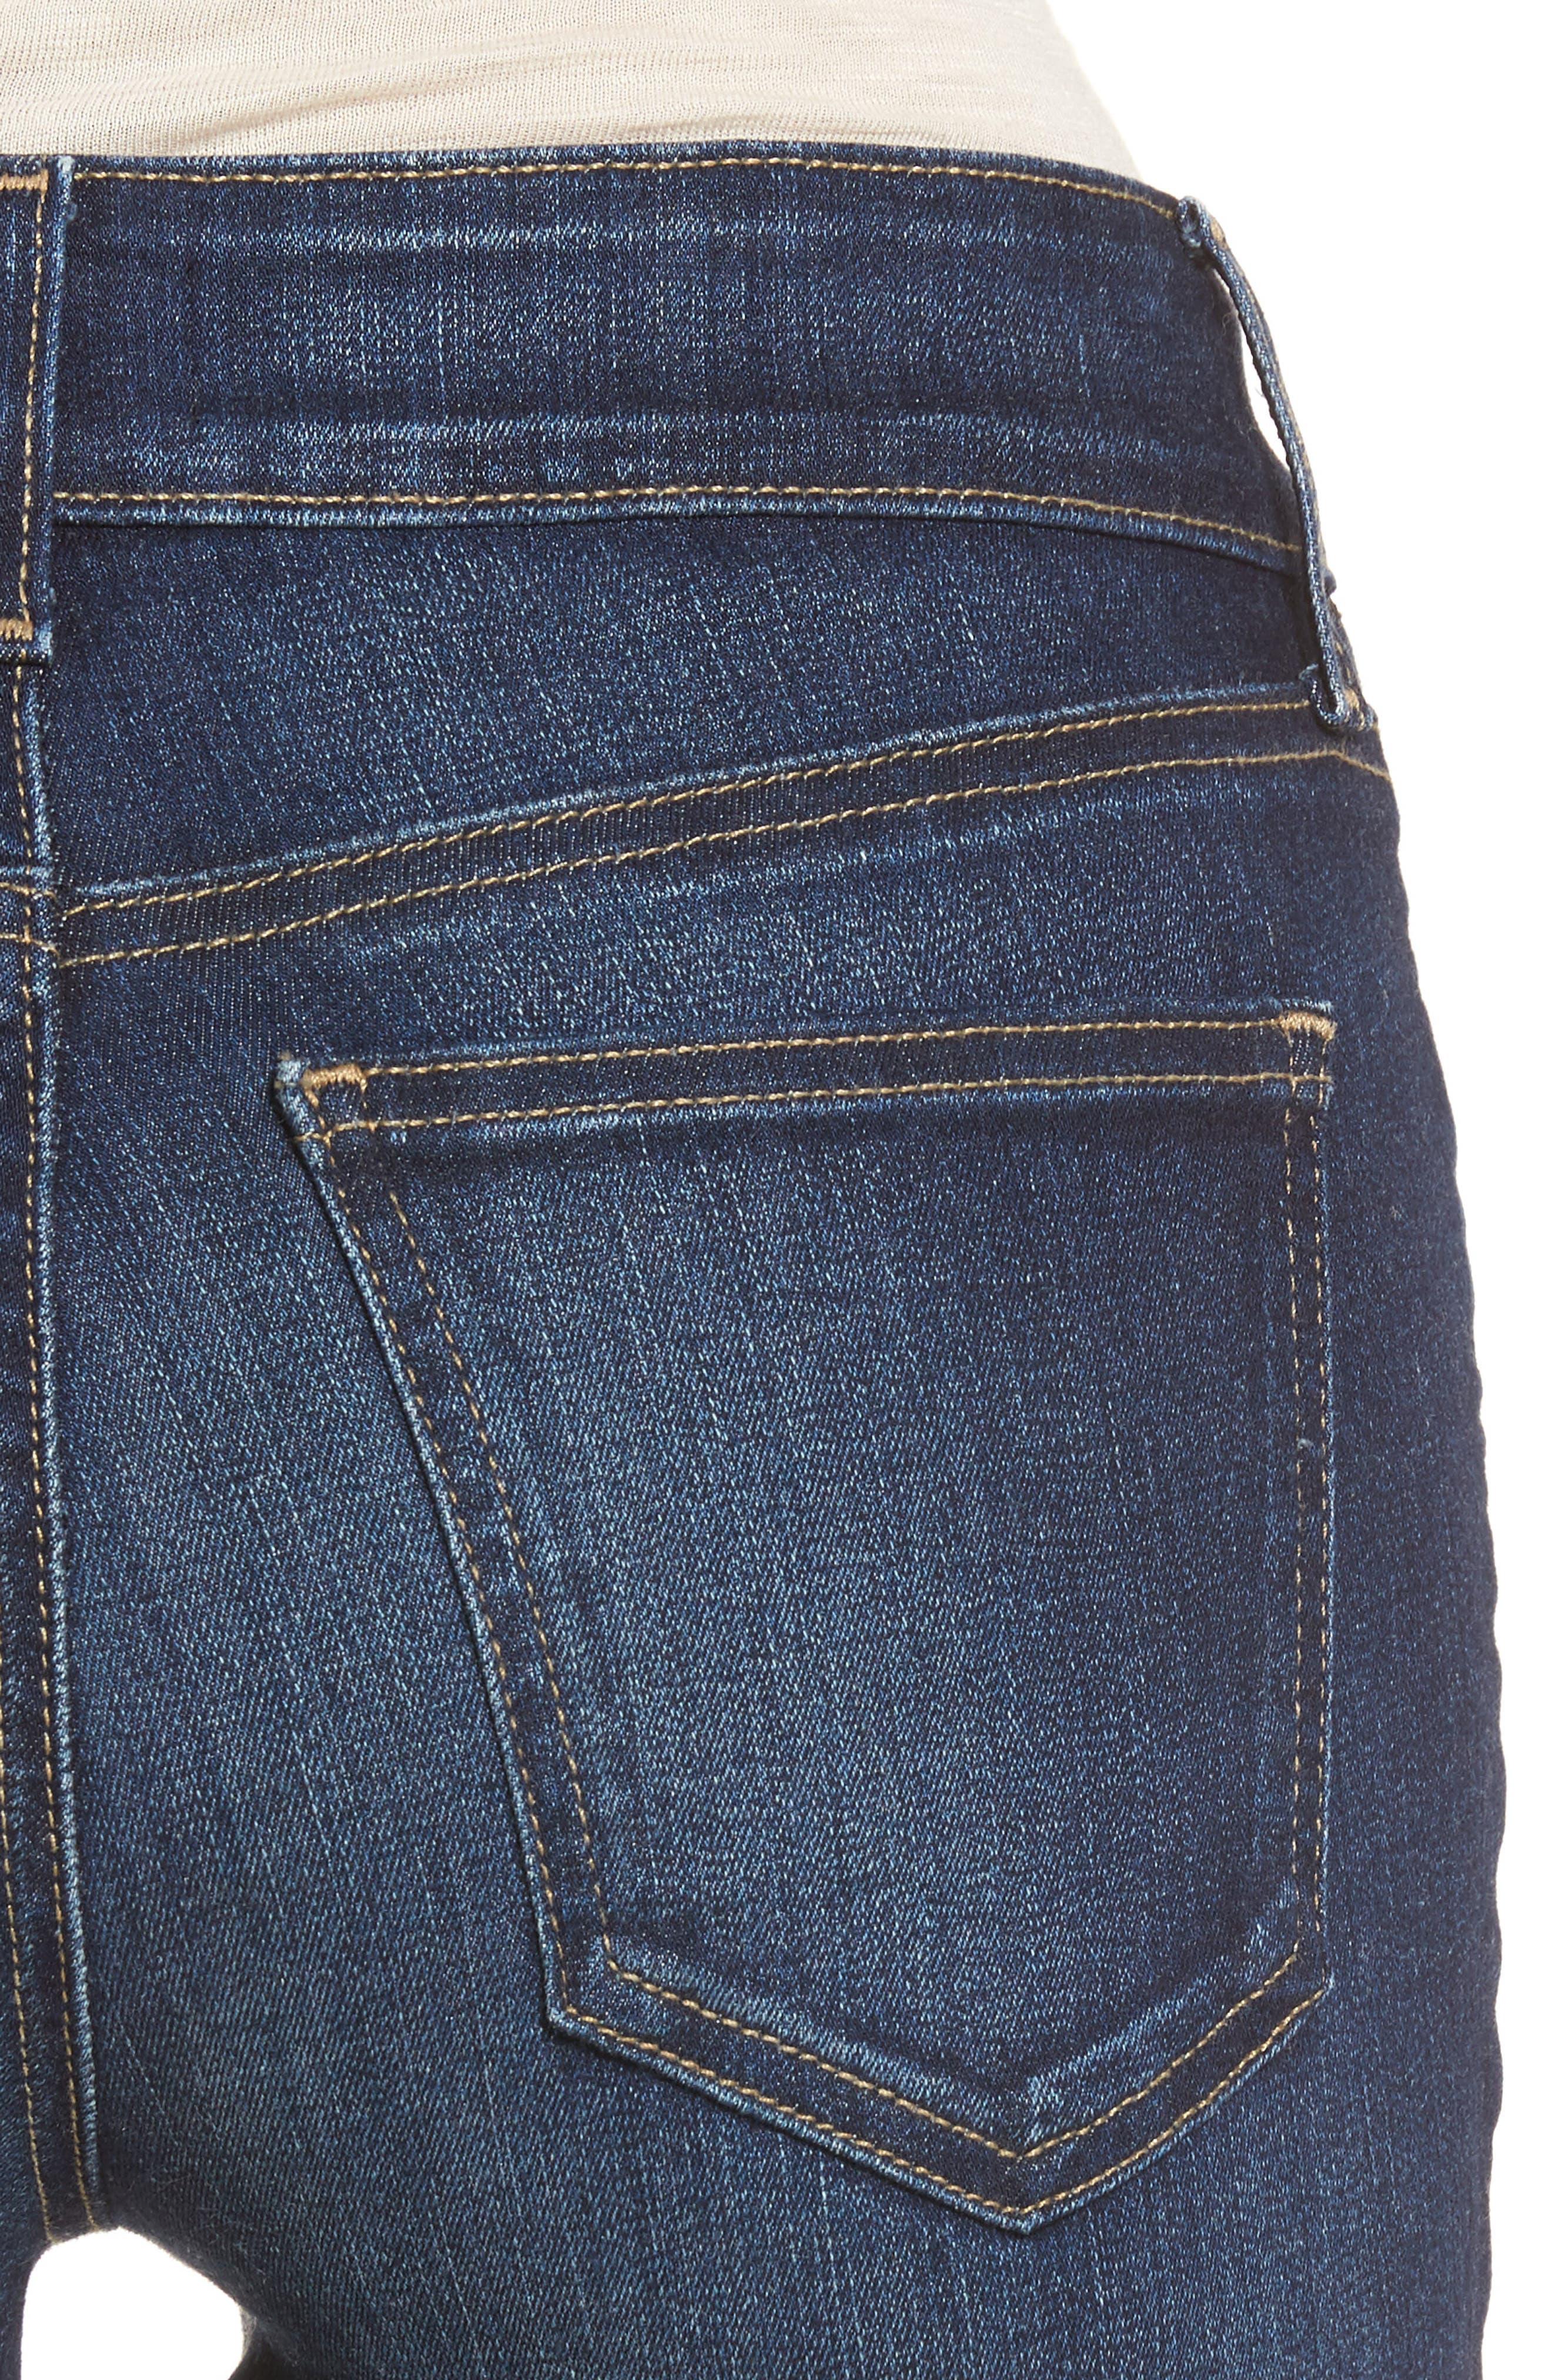 Alina Release Hem Stretch Ankle Jeans,                             Alternate thumbnail 4, color,                             421